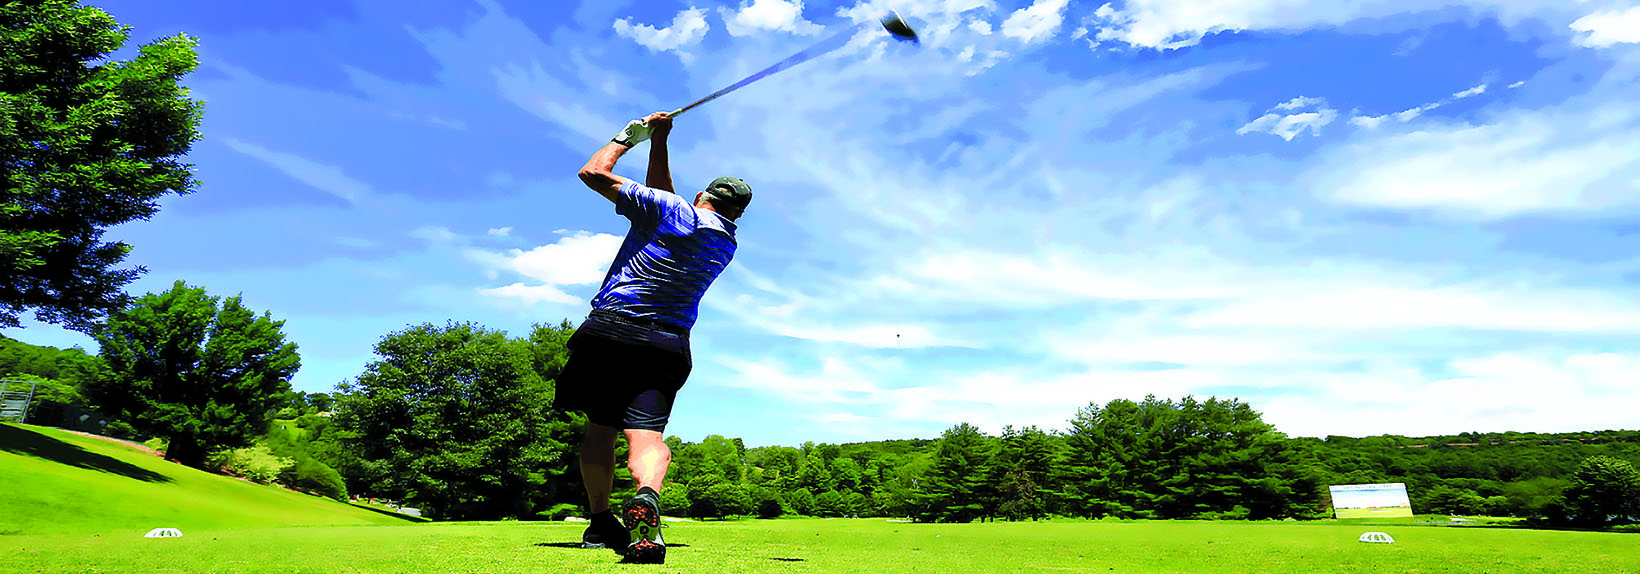 masiello-golf-swing-pic